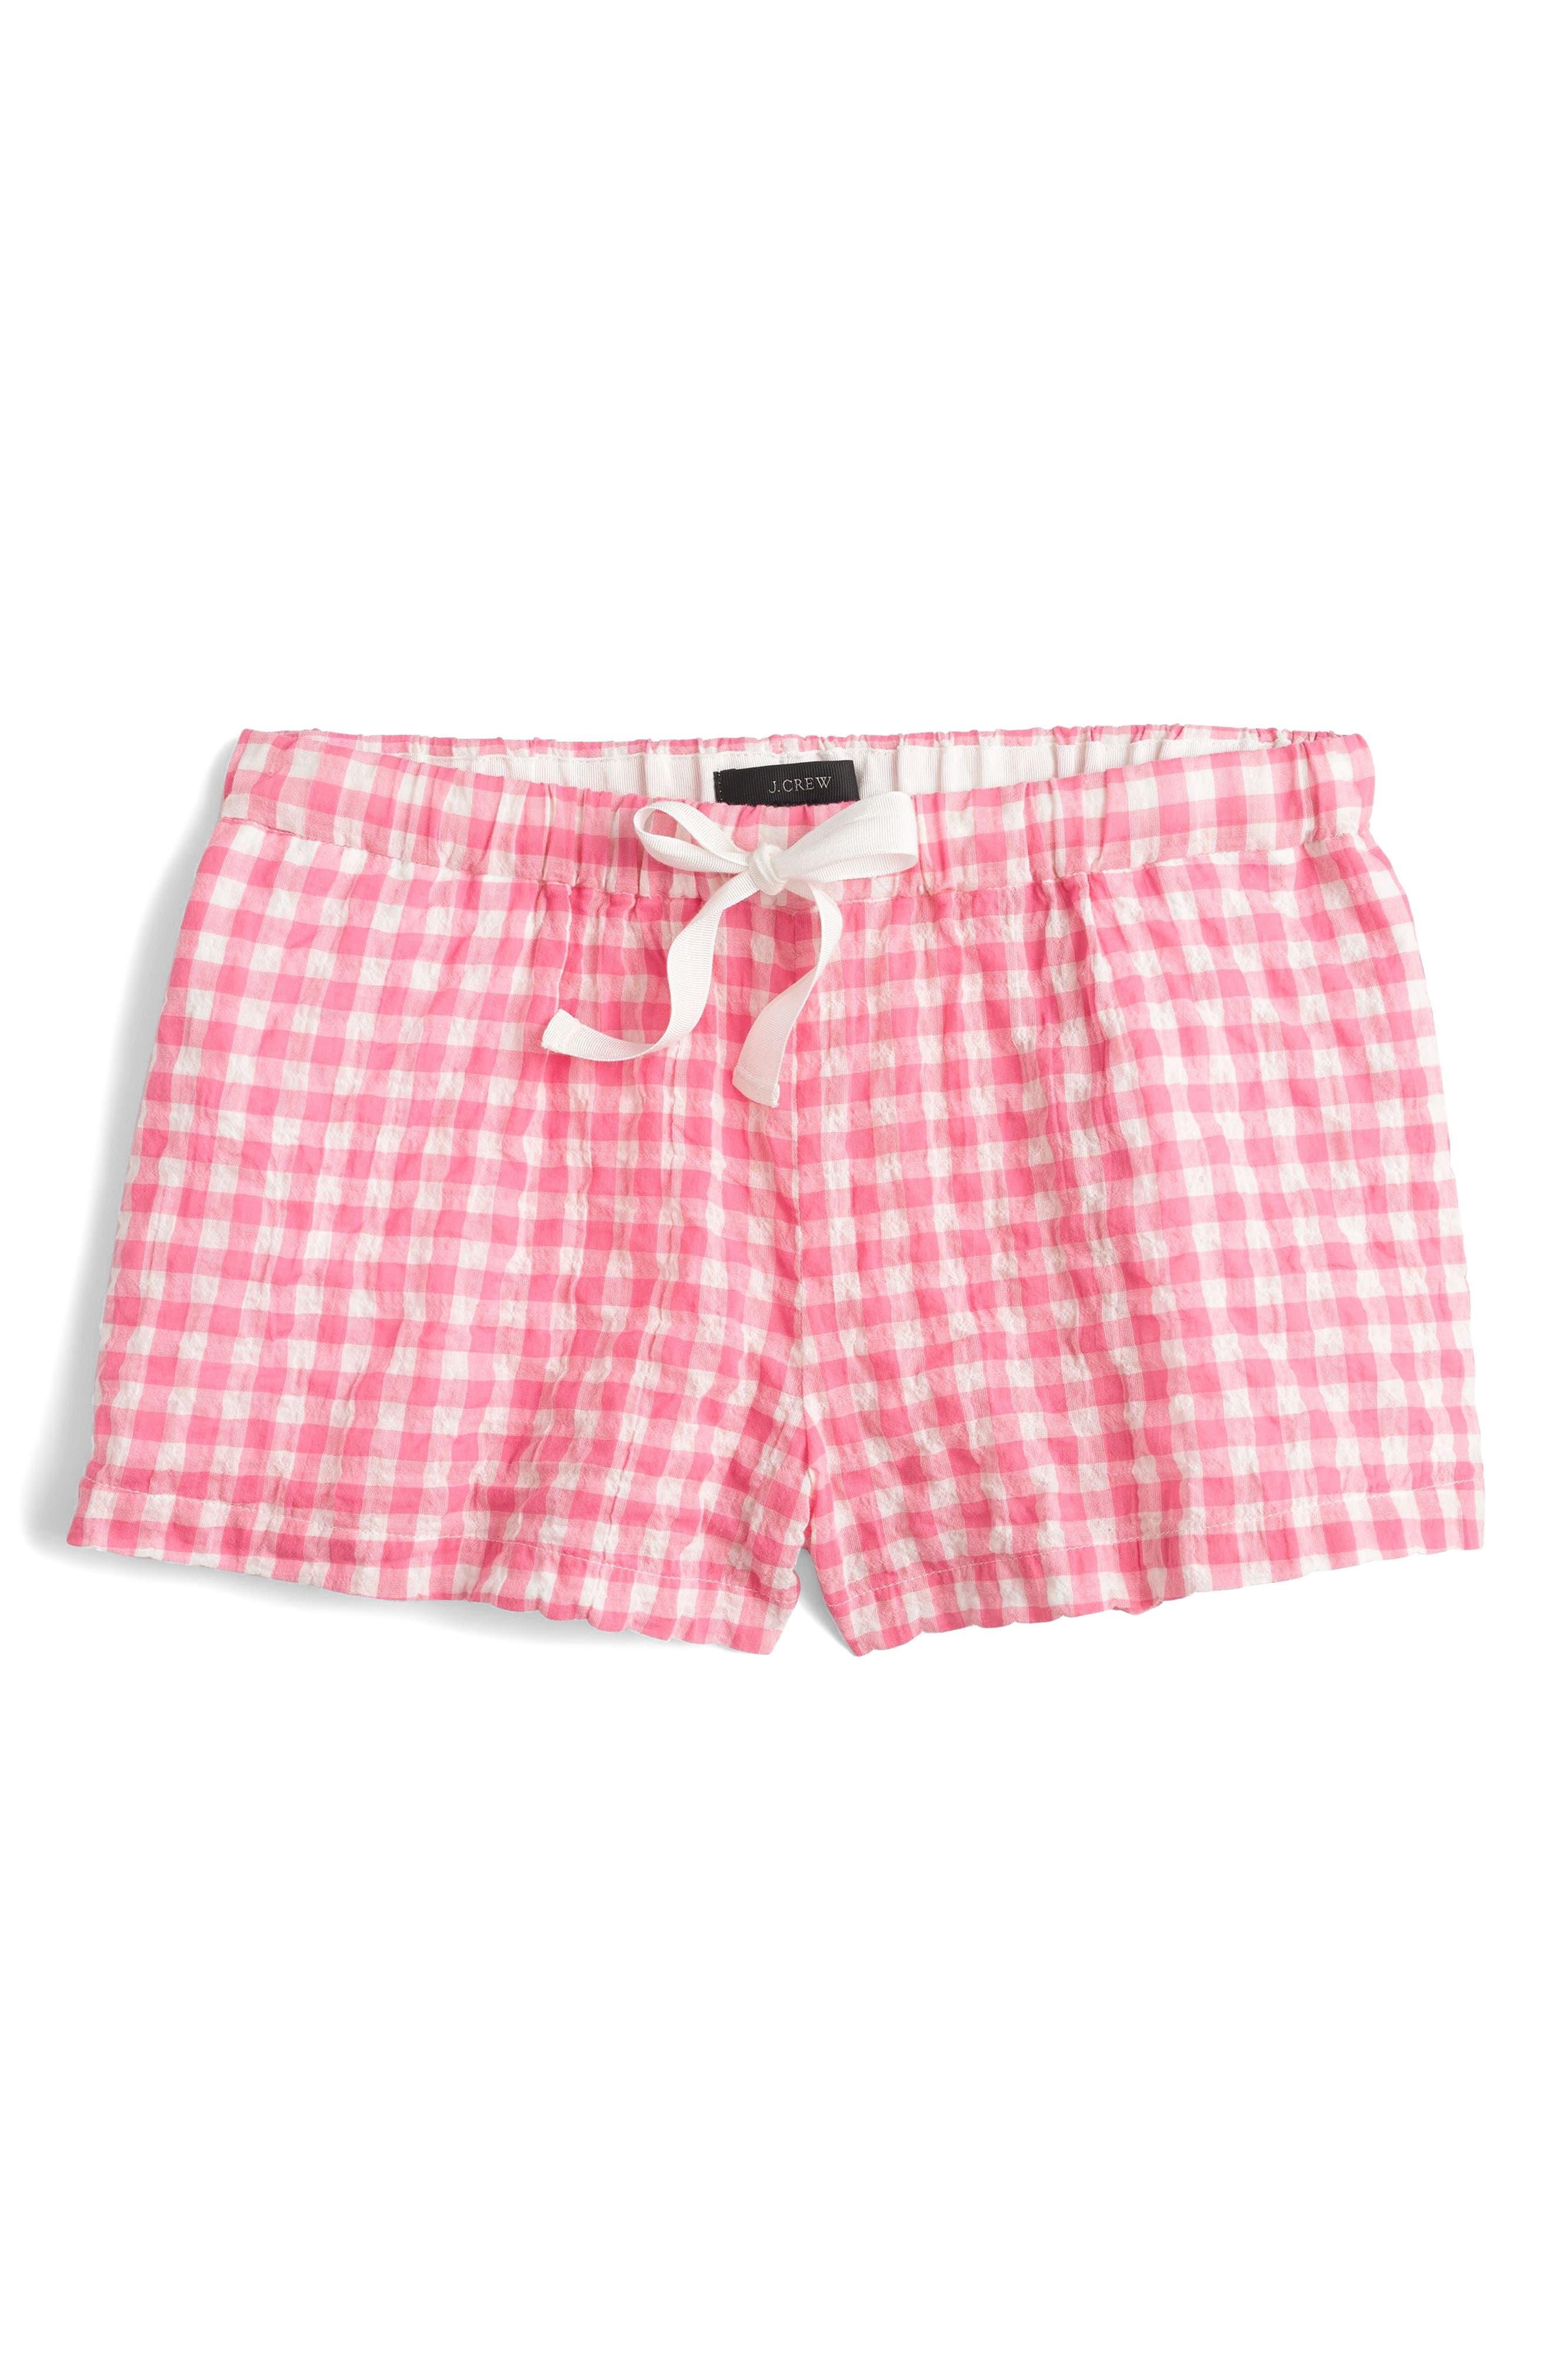 J.Crew Gingham Pajama Set,                             Alternate thumbnail 3, color,                             Ivory Pink